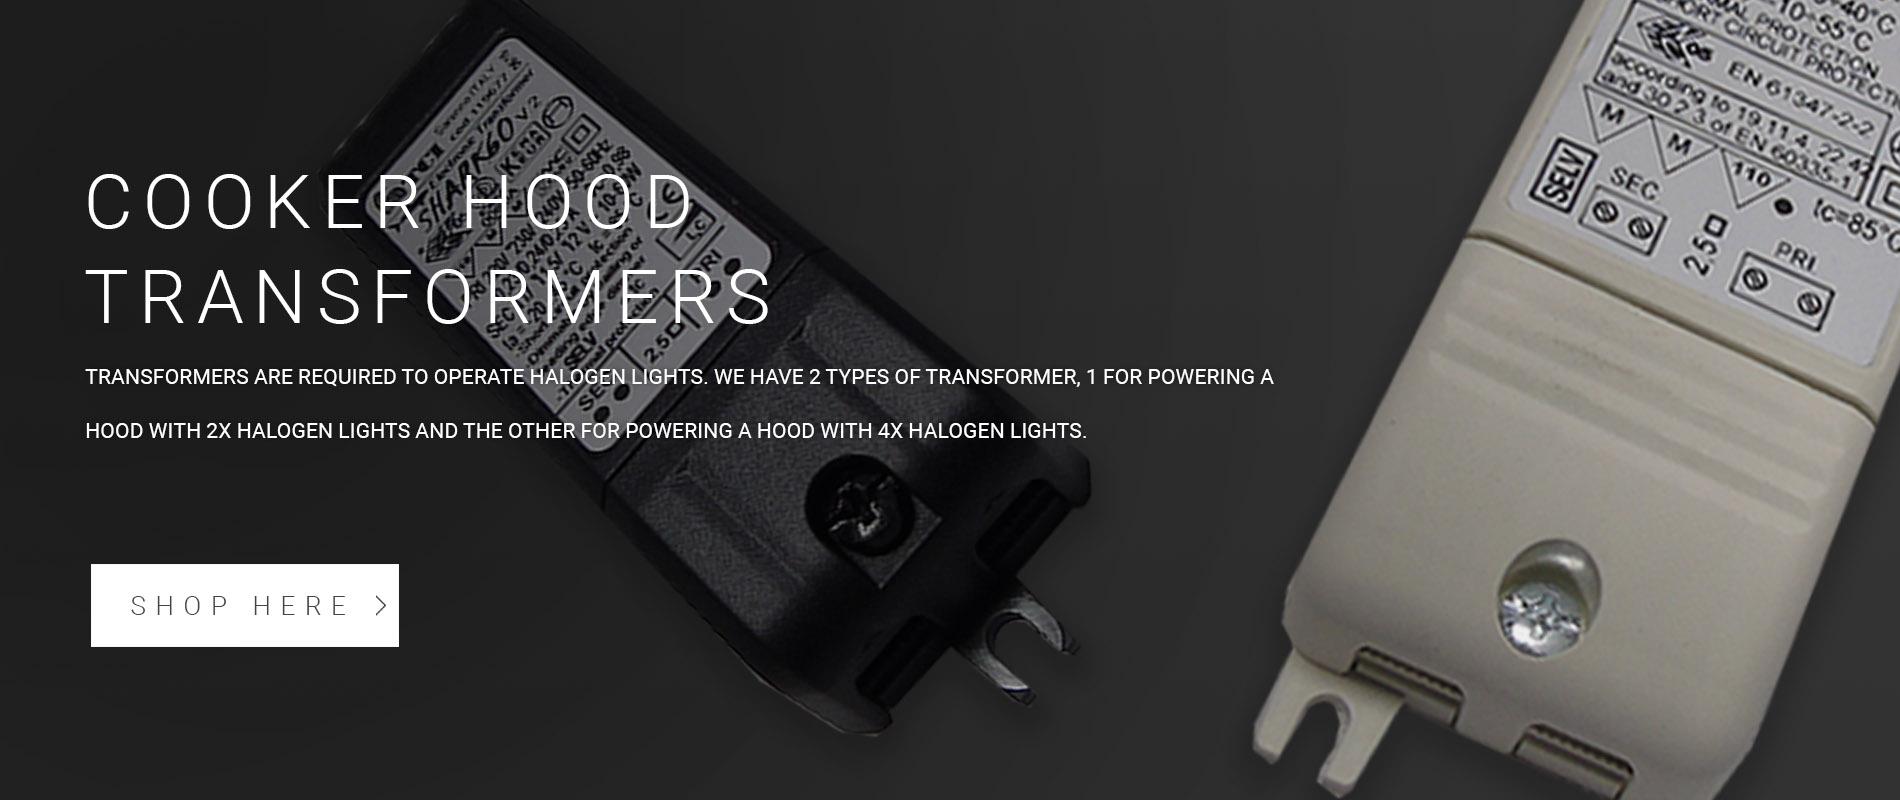 Cooker Hood Transformers